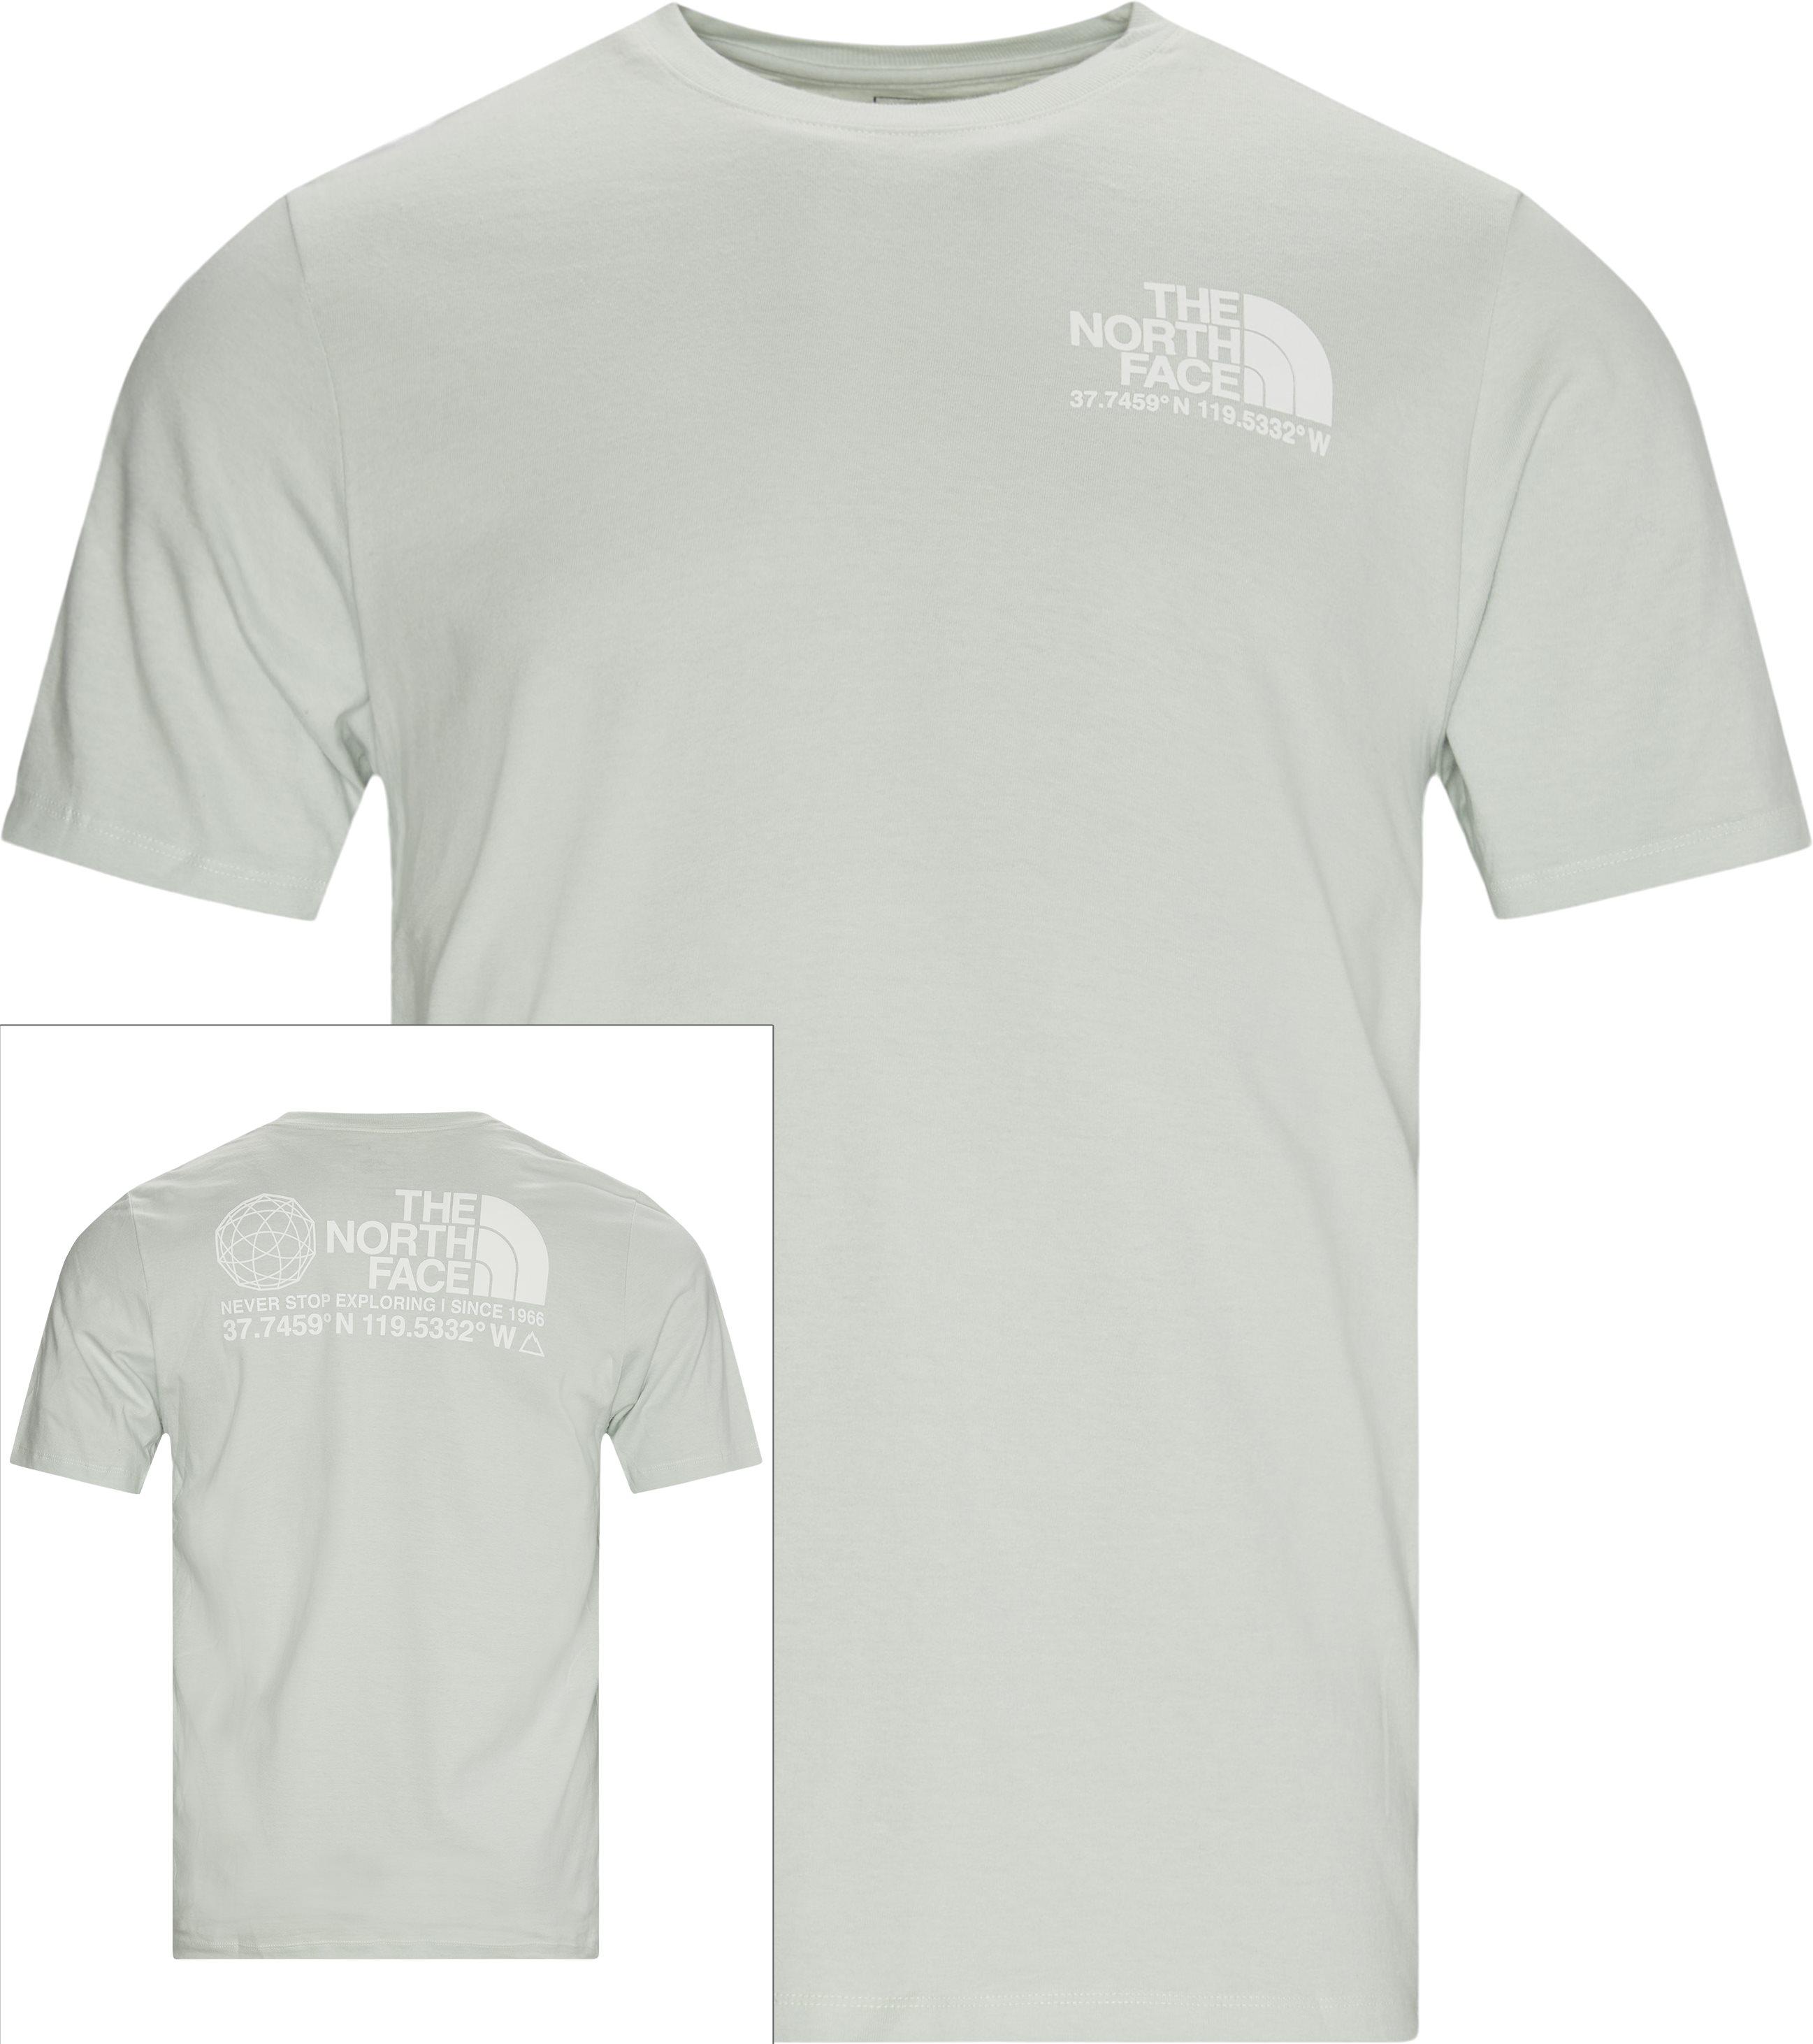 Coordinates Tee - T-shirts - Regular fit - Green